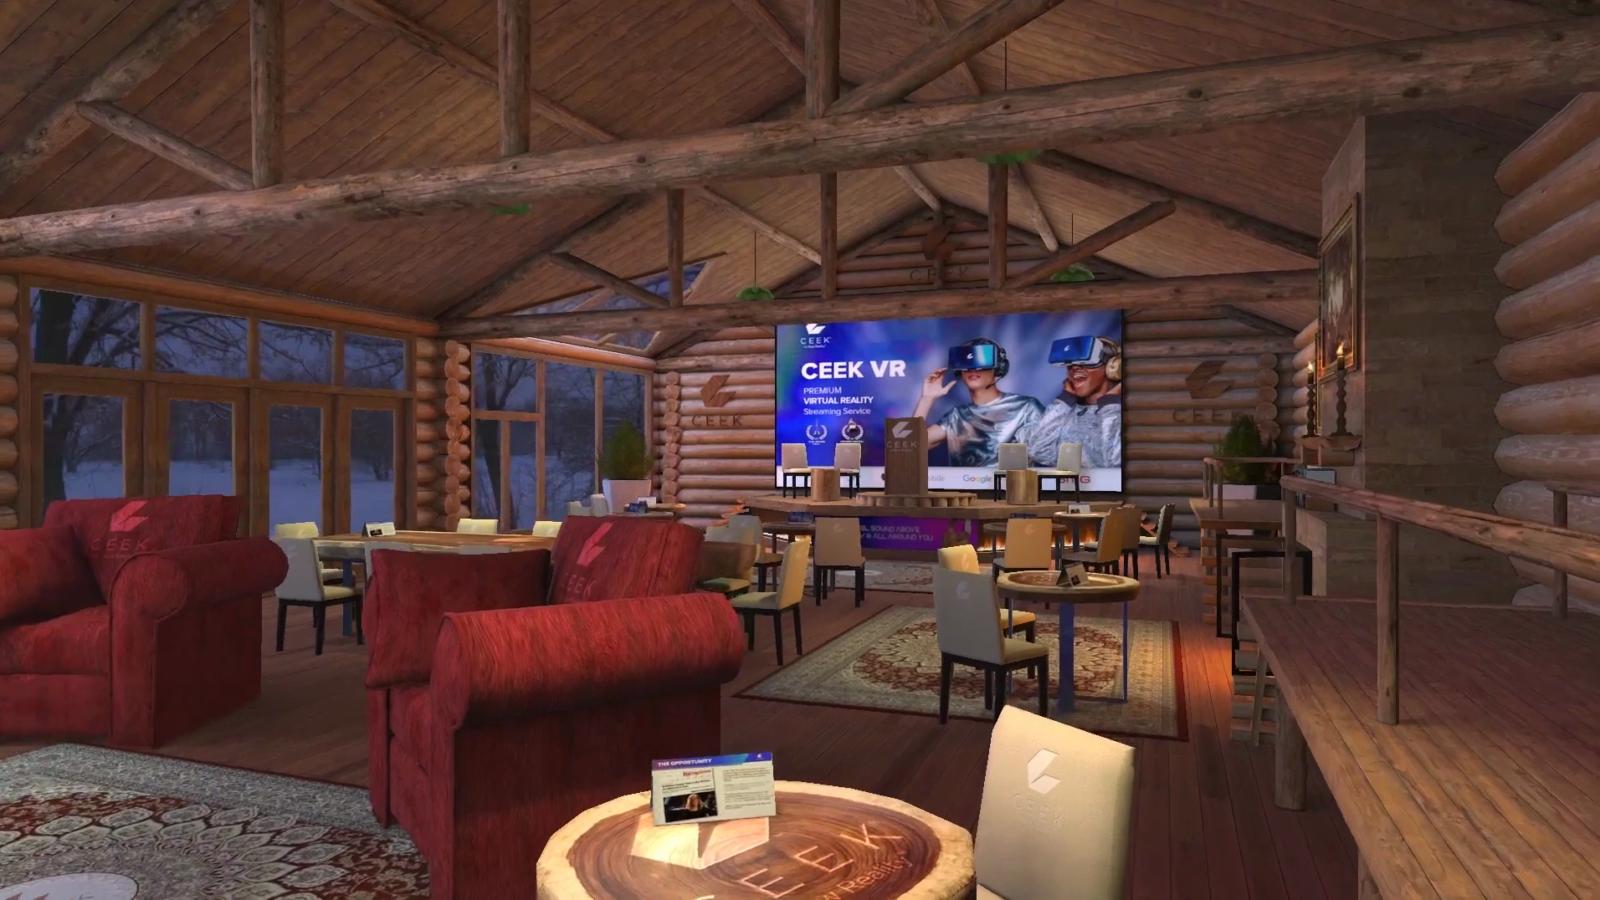 CEEK Virtual Conference Centre - Log cabin